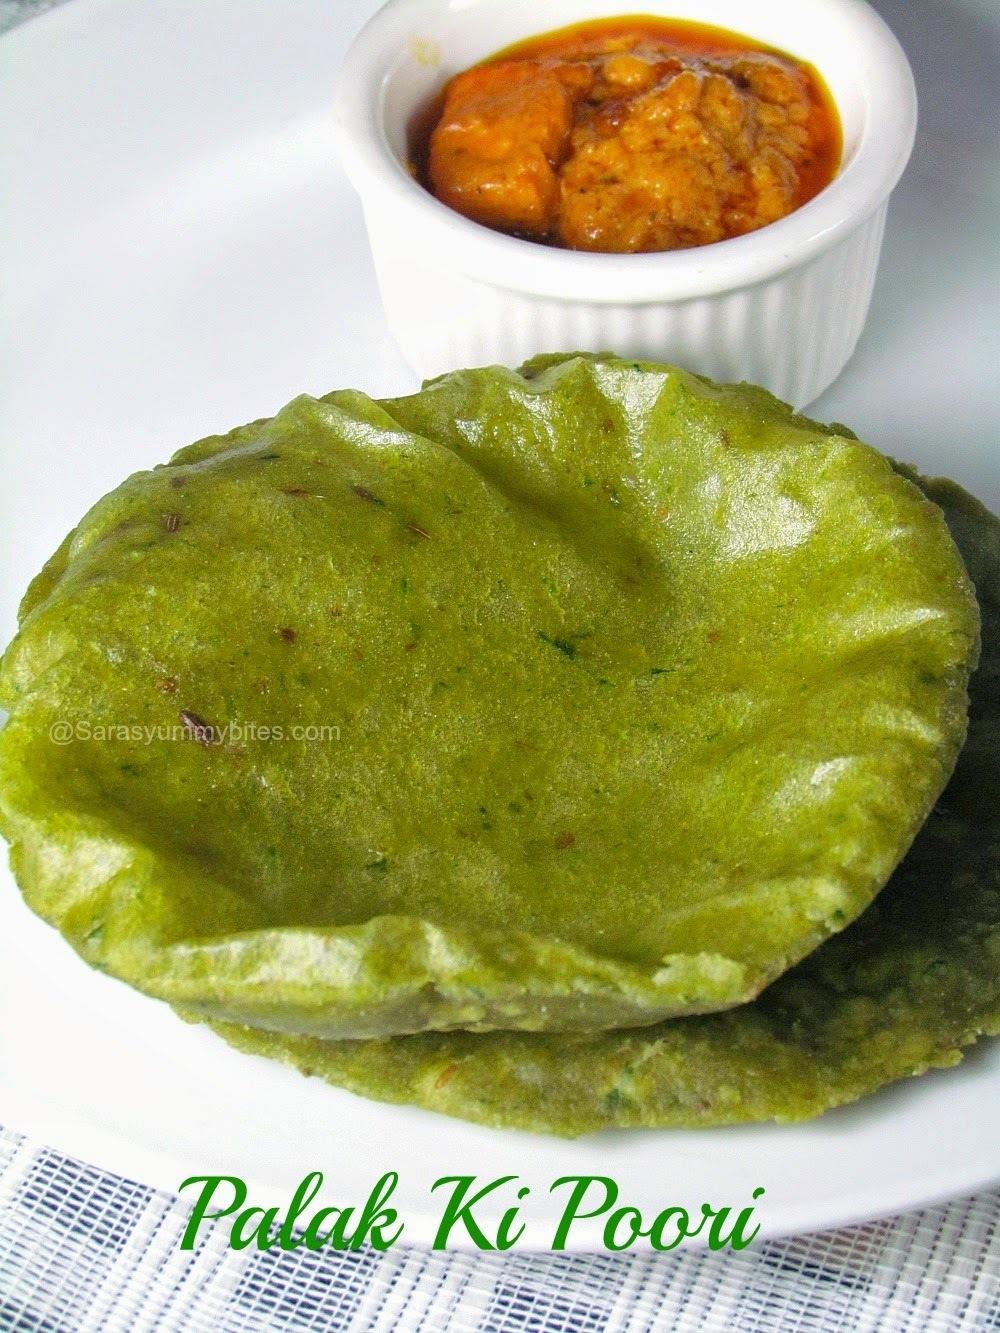 Palak Ki Poori / Spinach Poori From Madhya Pradesh